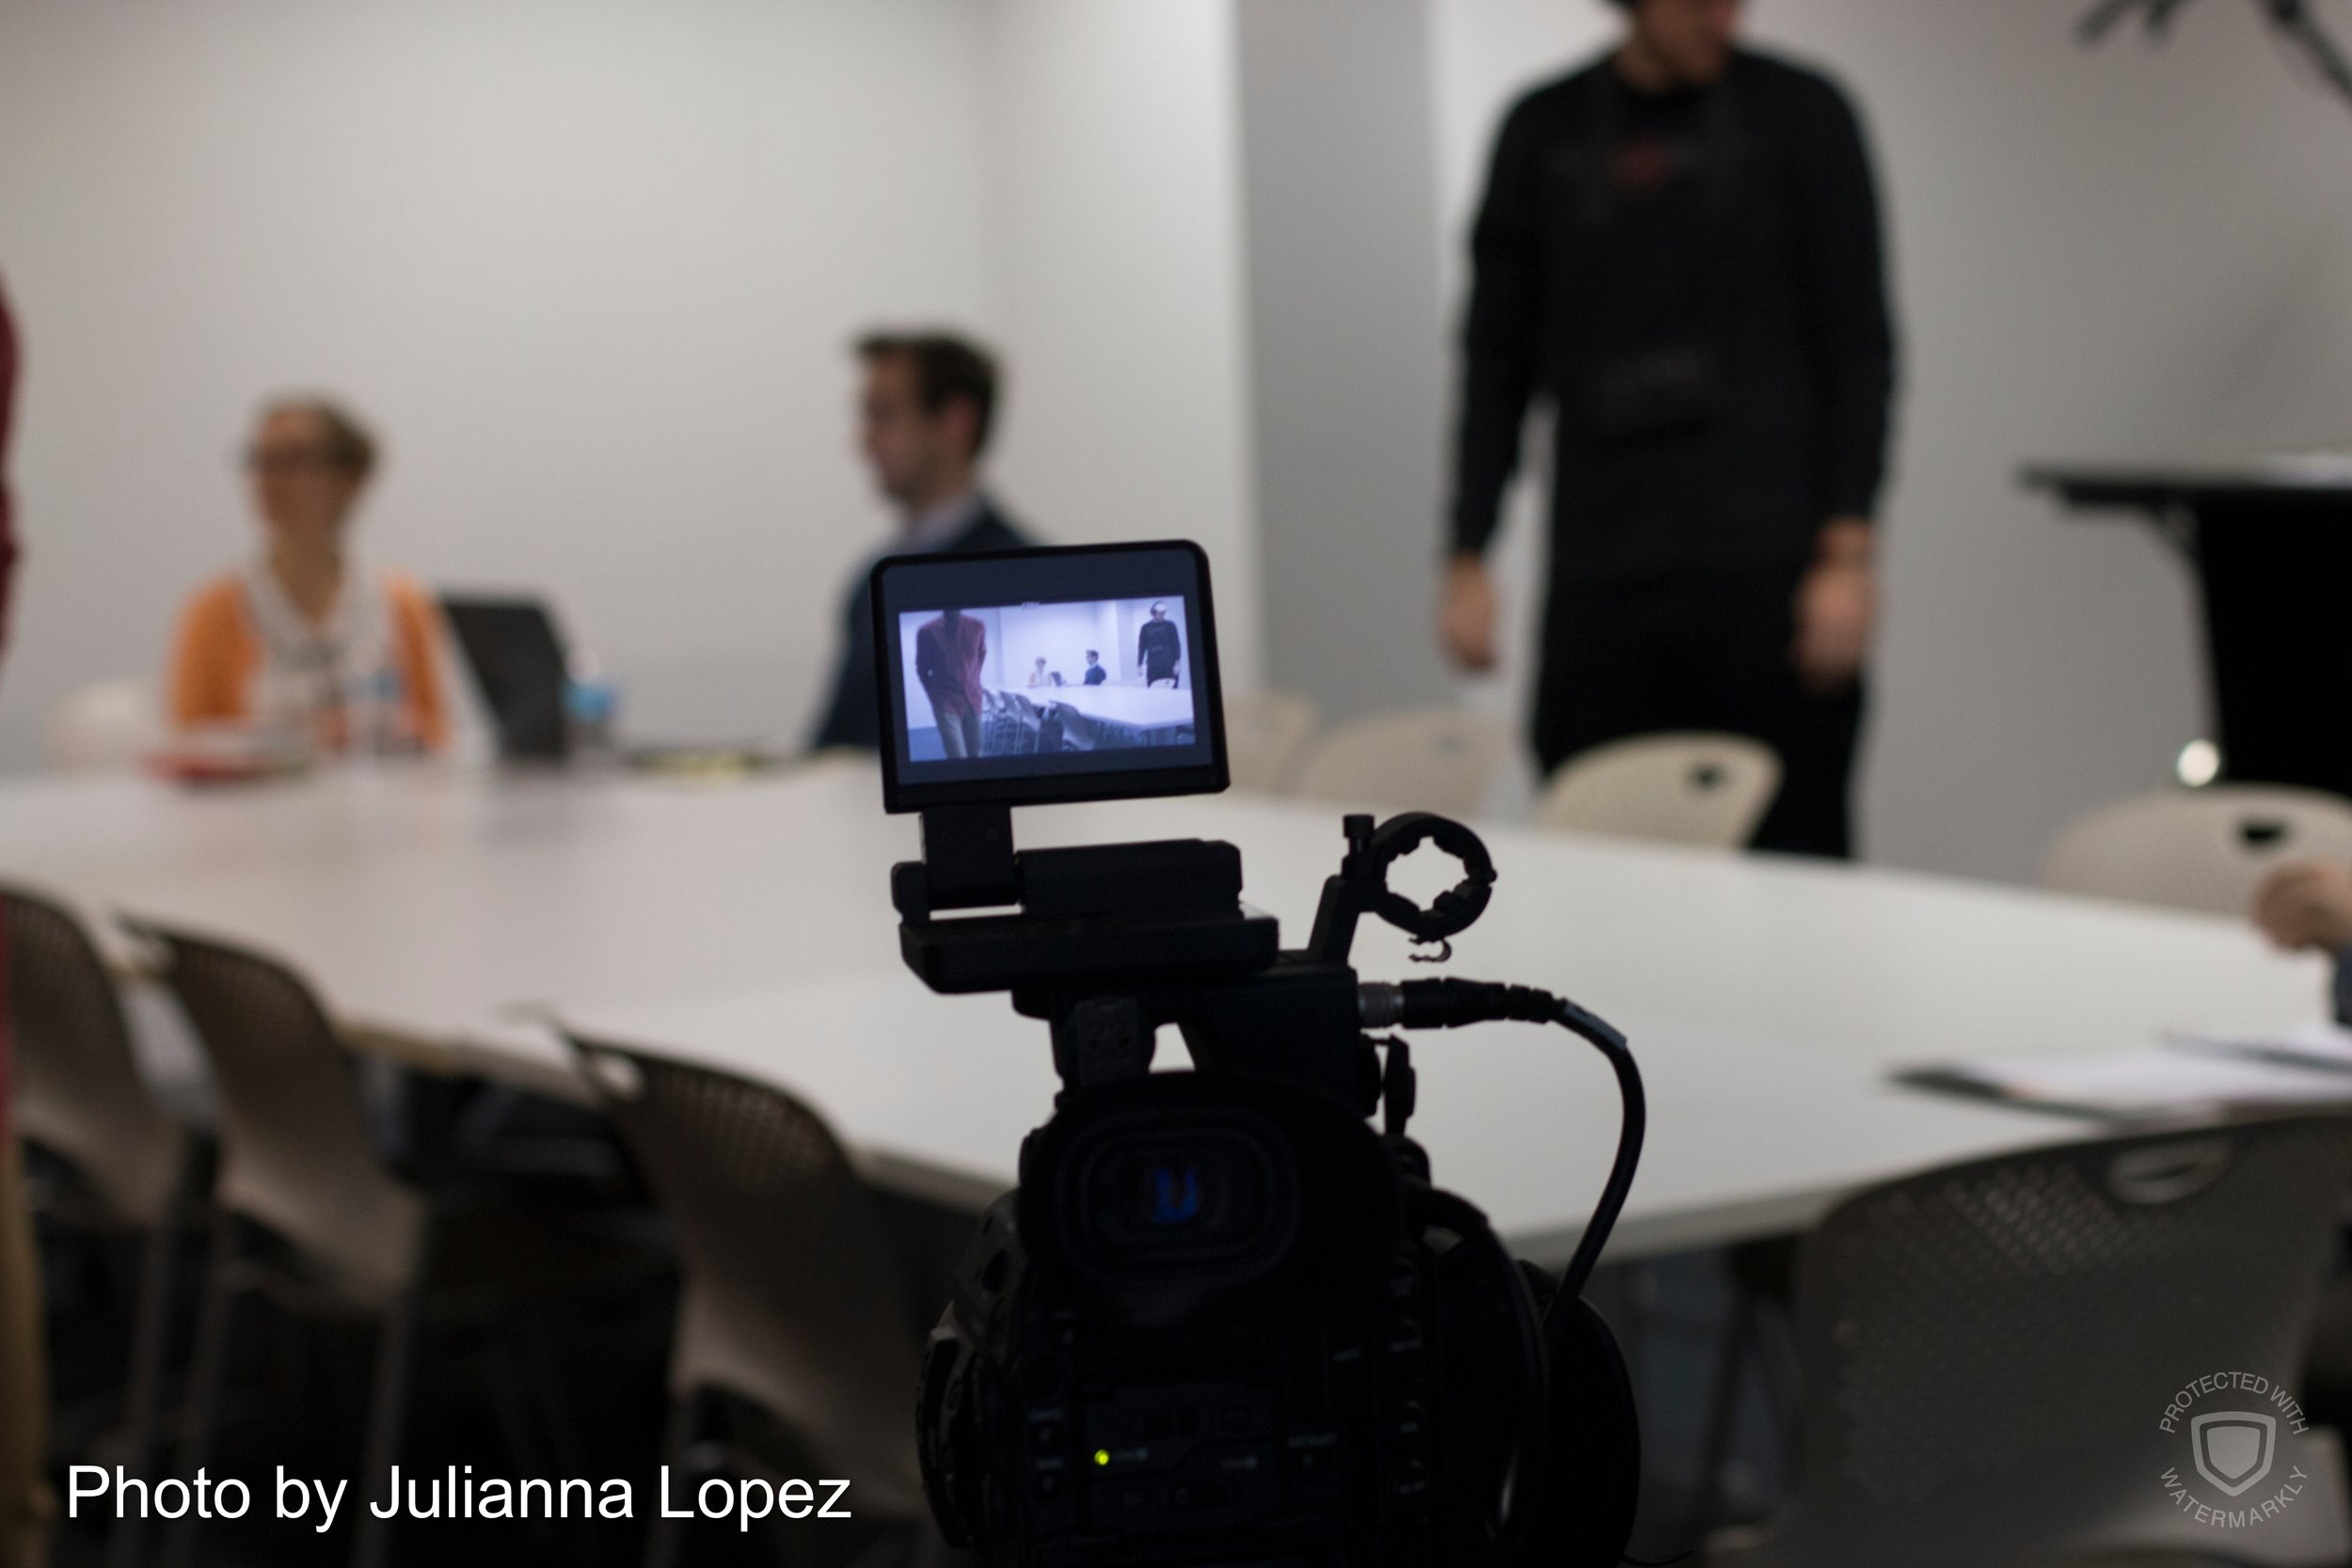 Julianna Lopez - IMG_6278.jpg